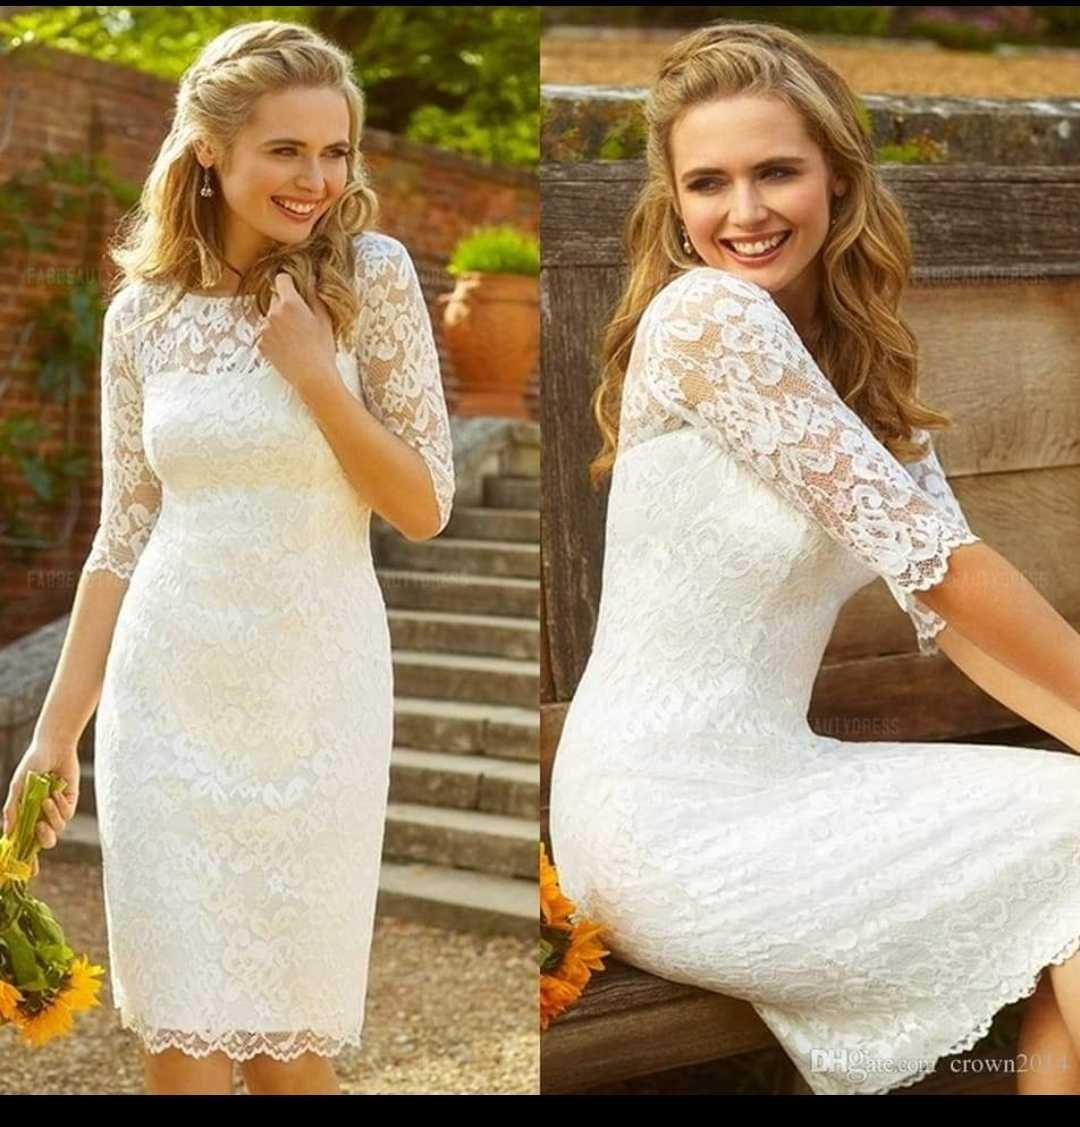 Vestidos boda civil blancos